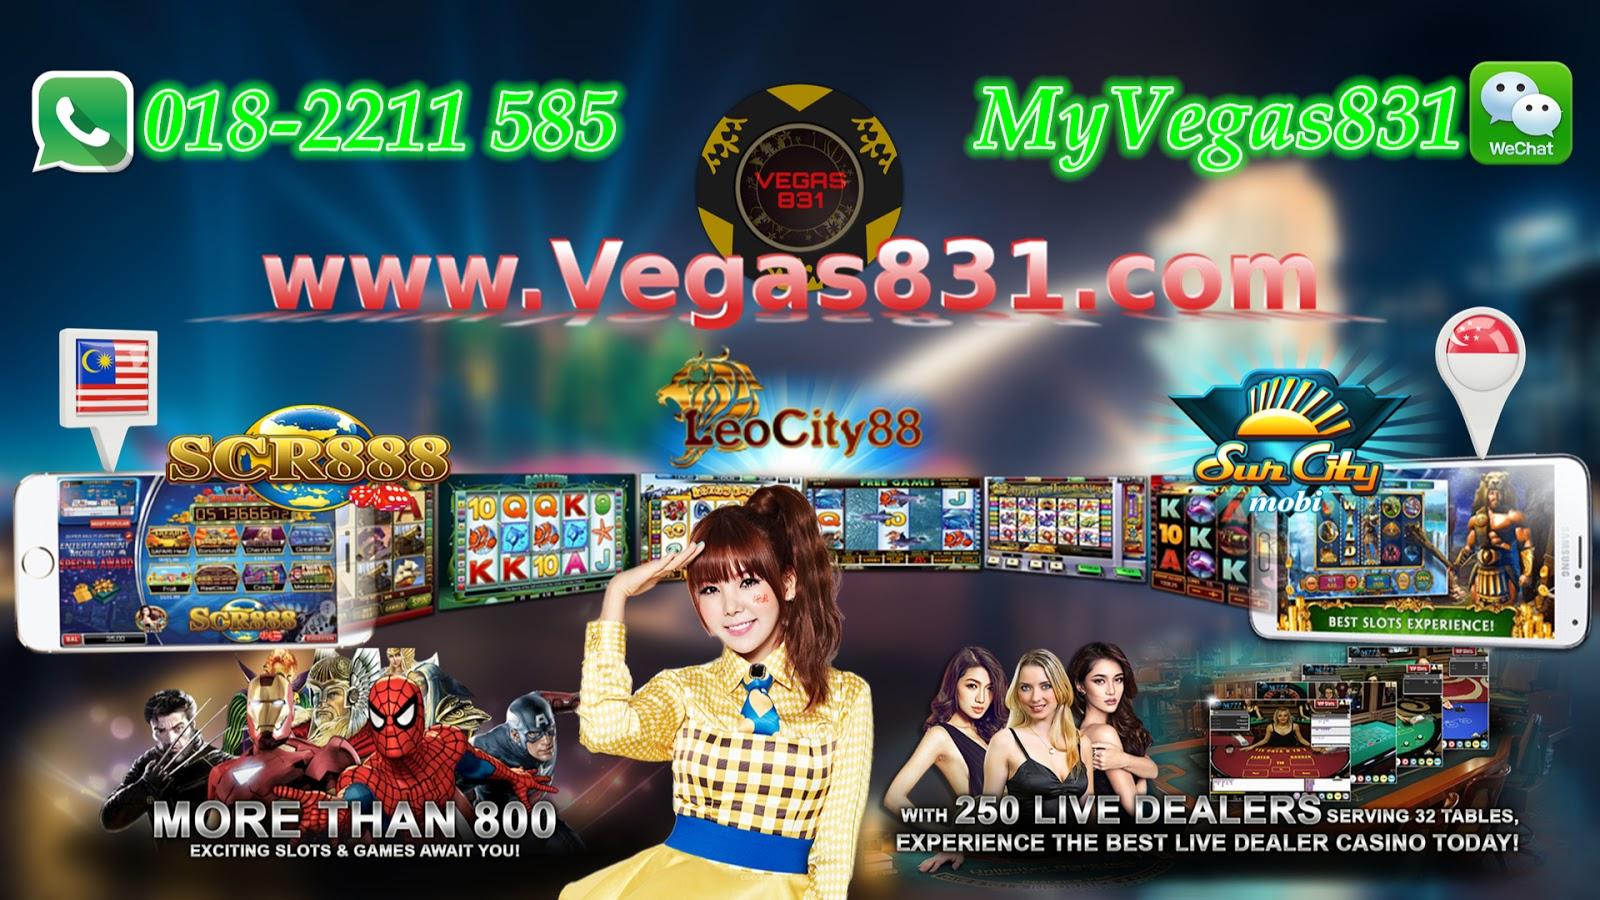 Online casino free credit 2019